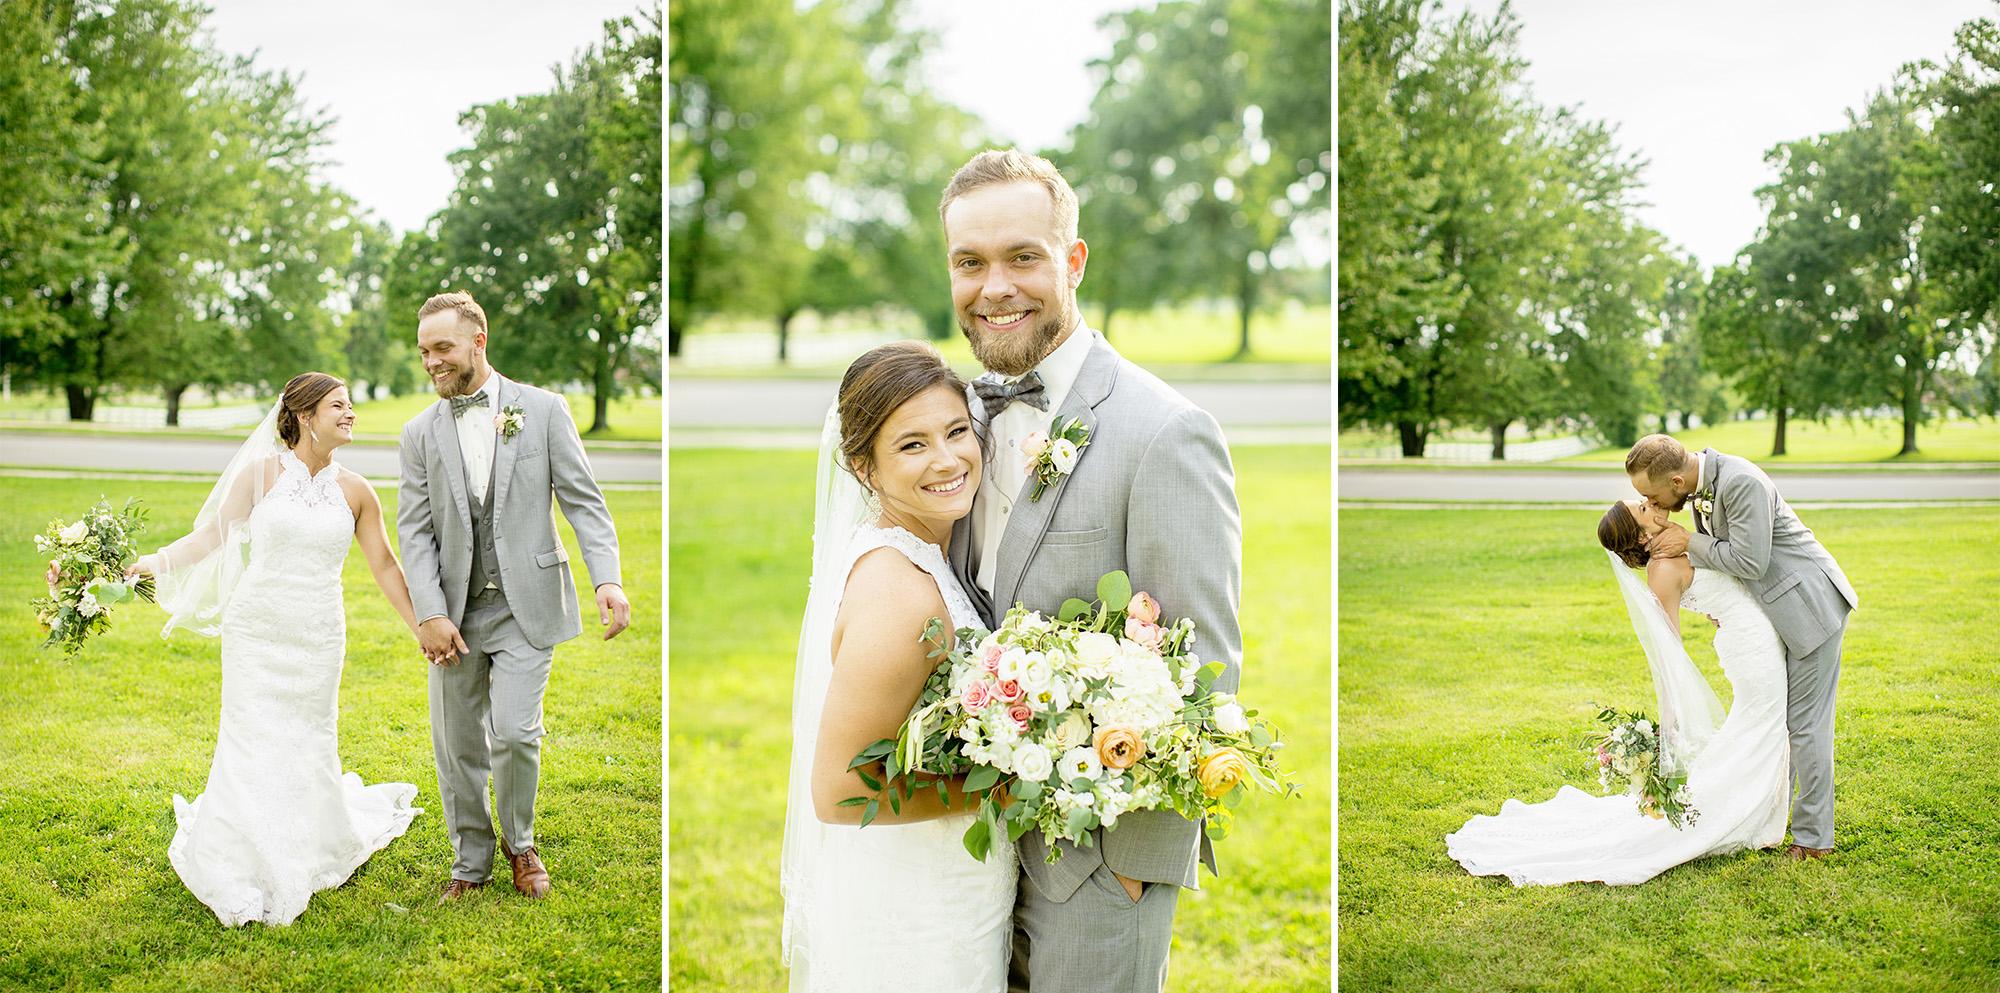 Seriously_Sabrina_Photography_Lexington_Kentucky_Round_Barn_Red_Mile_Stable_of_Memories_Wedding_Hart_84.jpg